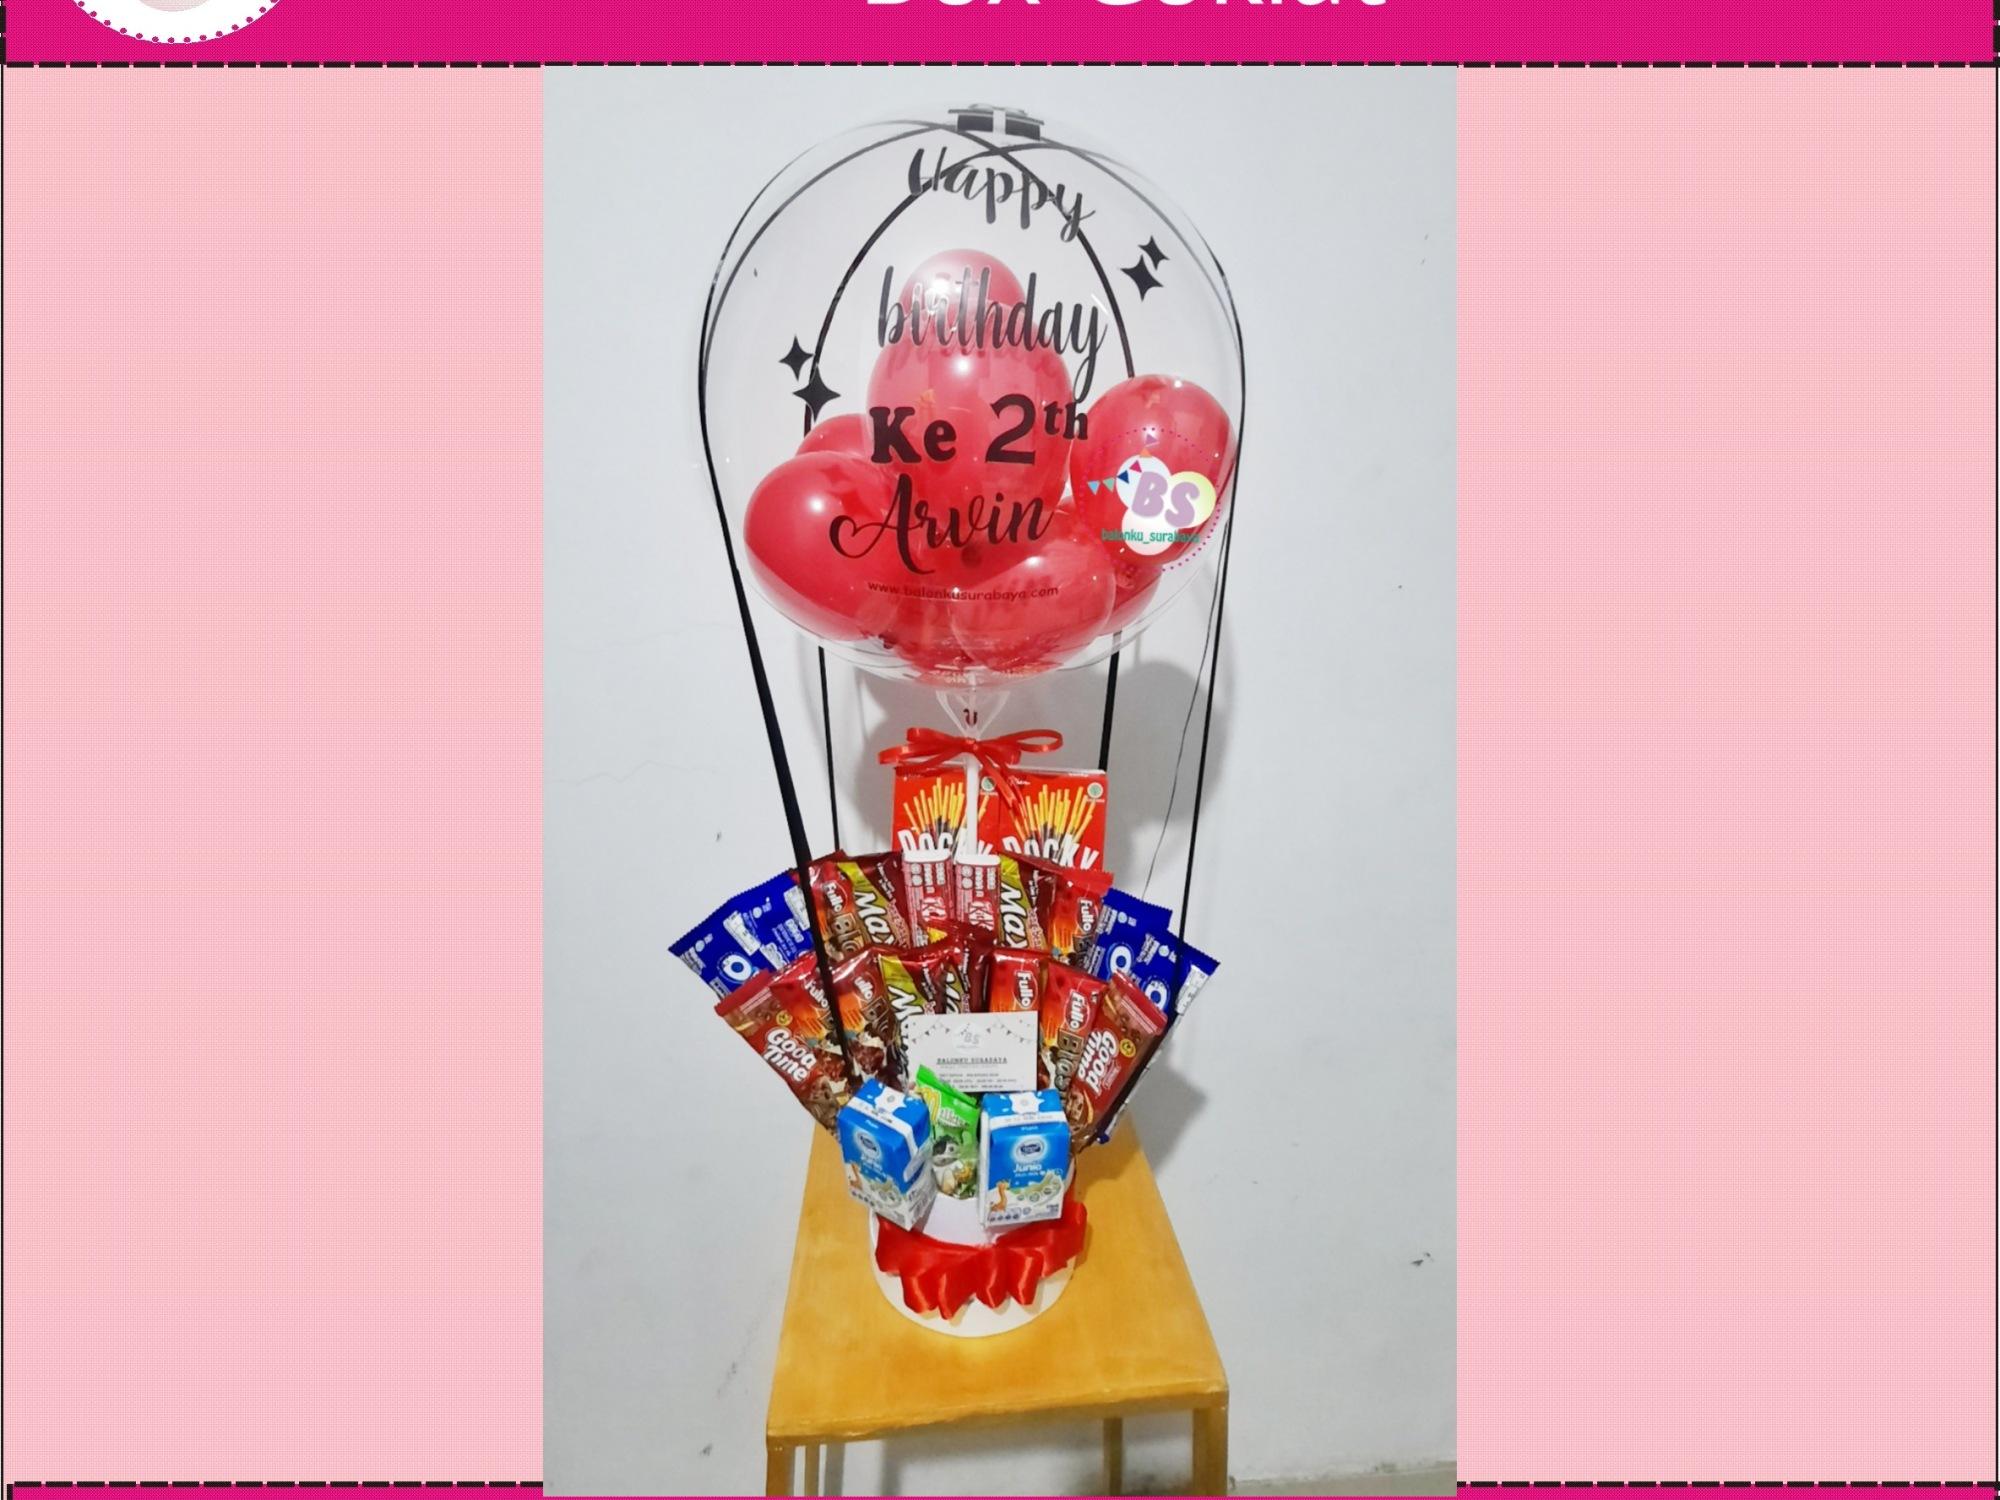 baln ucapan box coklat, jual balon latex twist hijau emerald, BAlon Gas,Bunga dekorasi,Rangkaian bunga artificial, Buket bunga, buket bunga mawar, harga buket bunga,Balon sablon, balon Printing, balon promosi, Perlengkapan ulang tahun, Balon latex , balon doff, balon natal, balon agustusan, balon dekorasi, balonku Surabaya, 085733133529